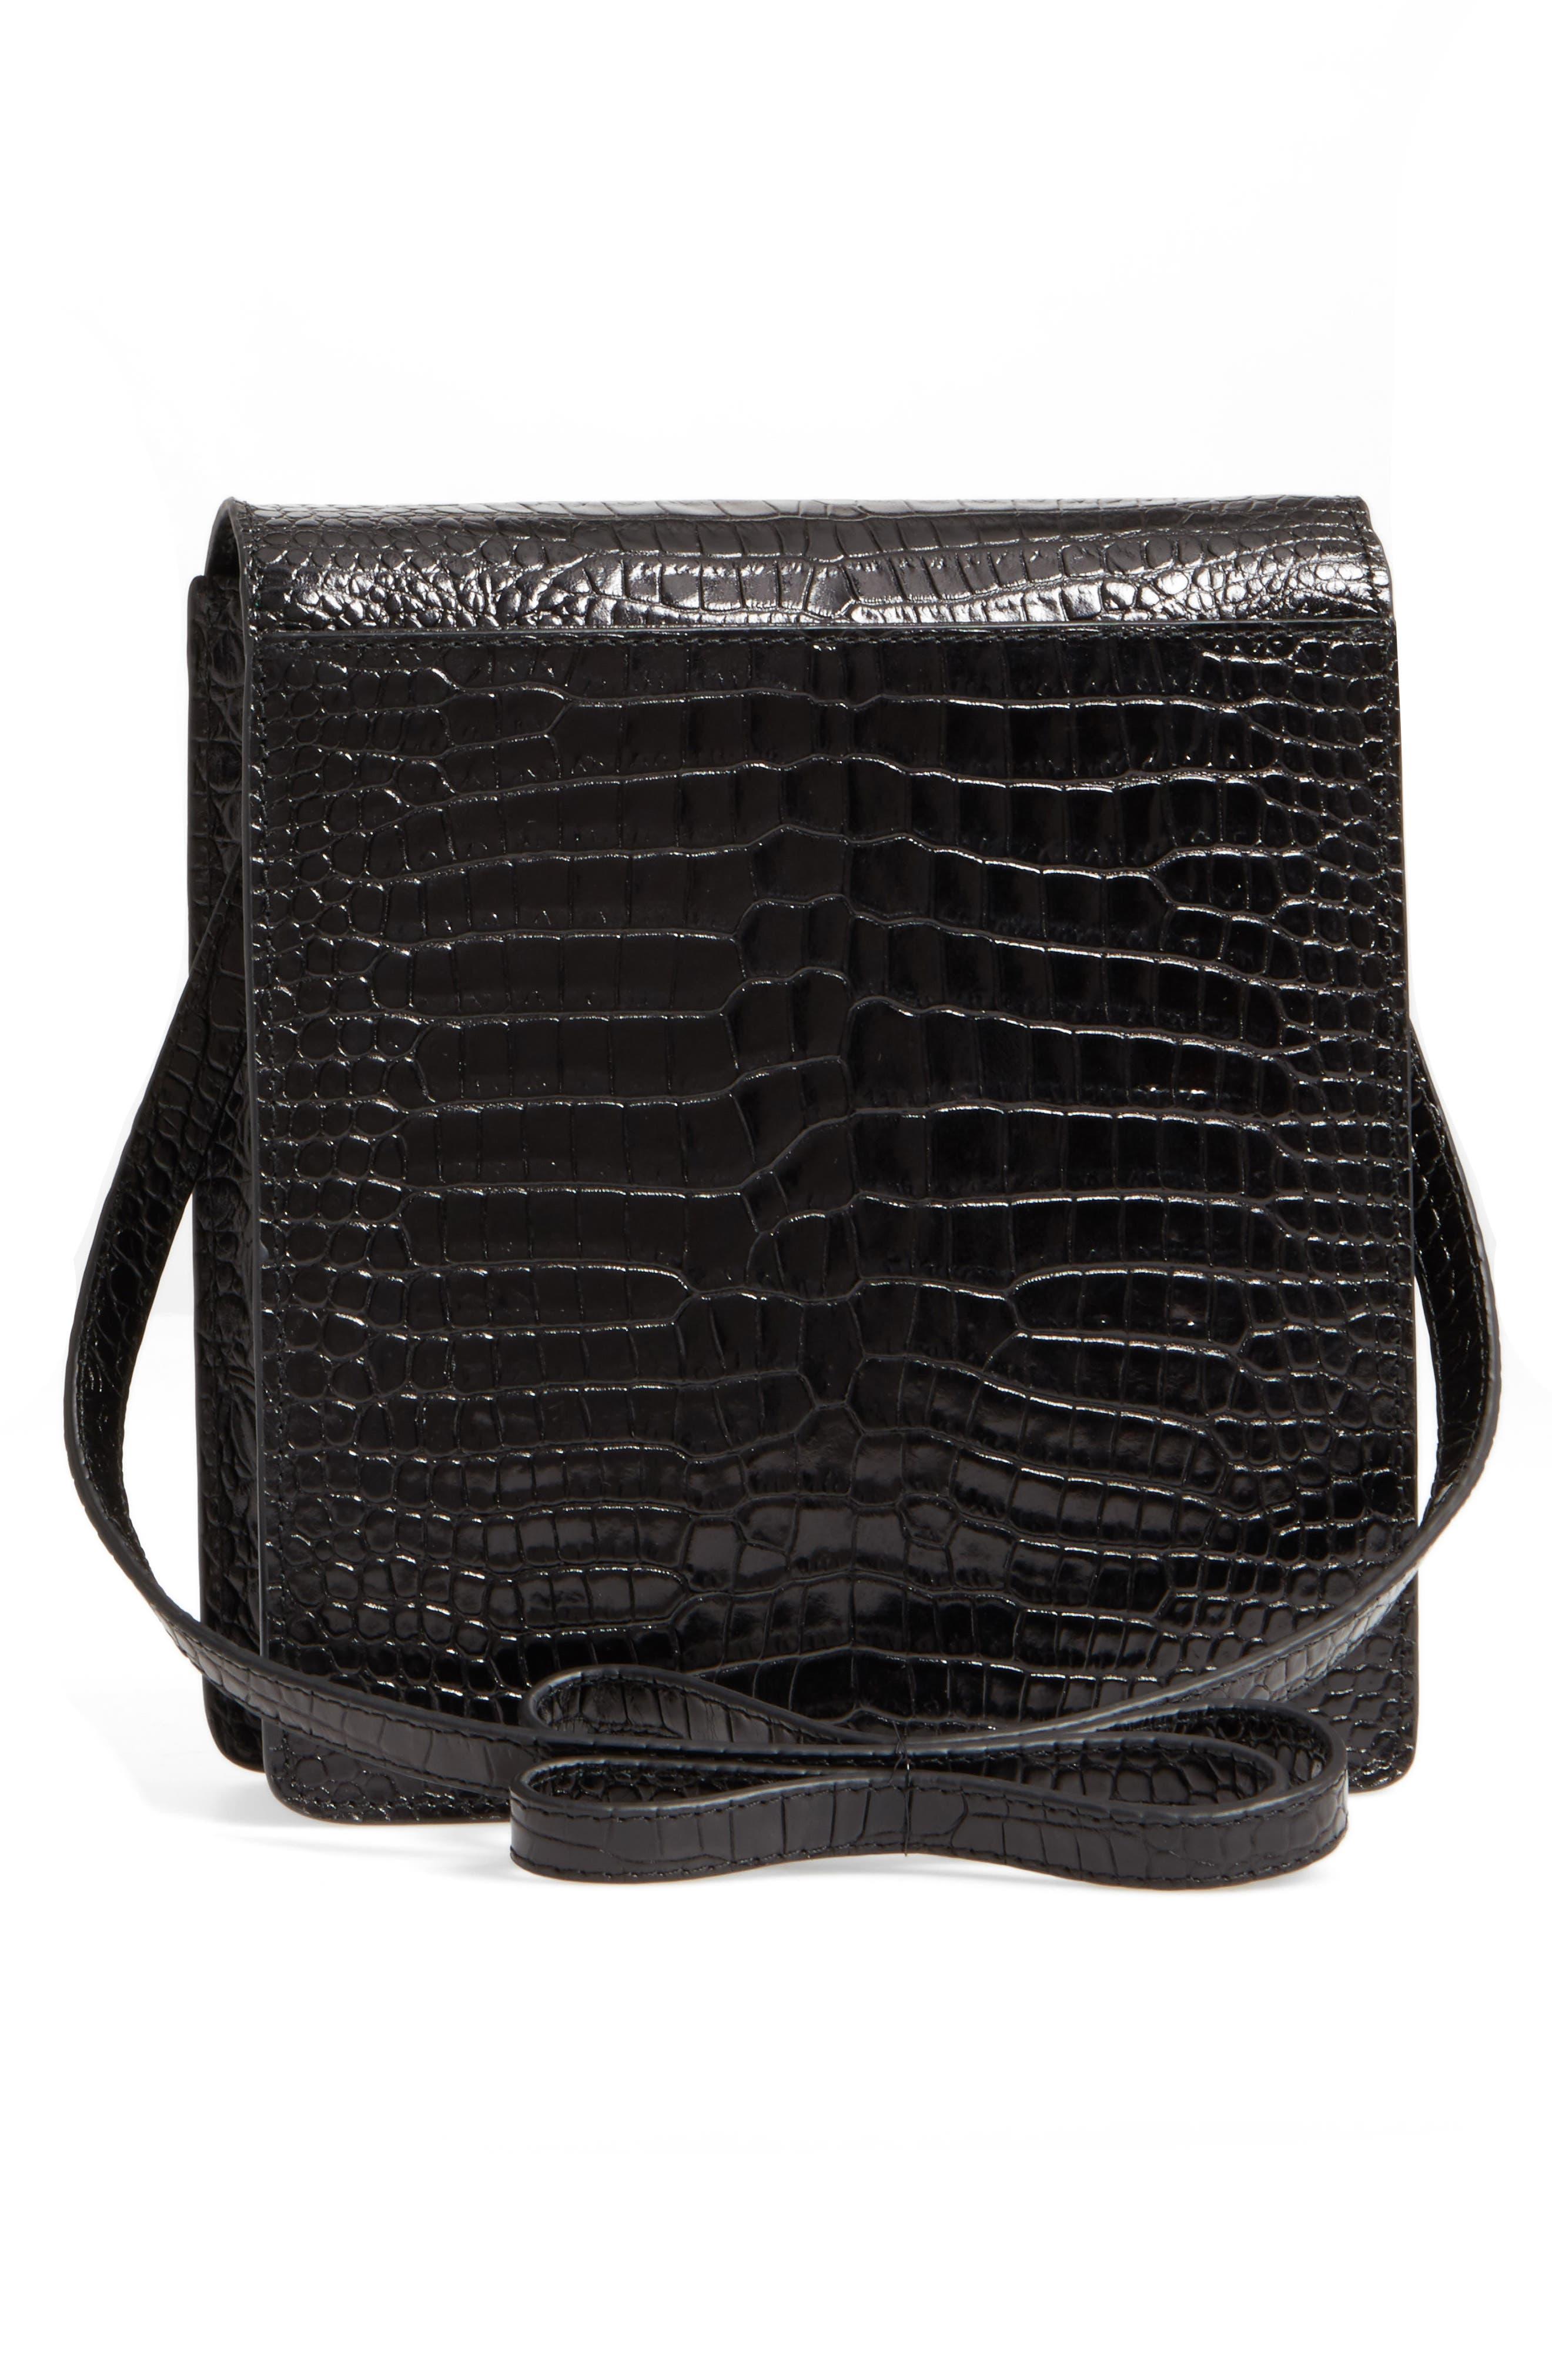 Eloise Leather Crossbody Bag,                             Alternate thumbnail 3, color,                             001